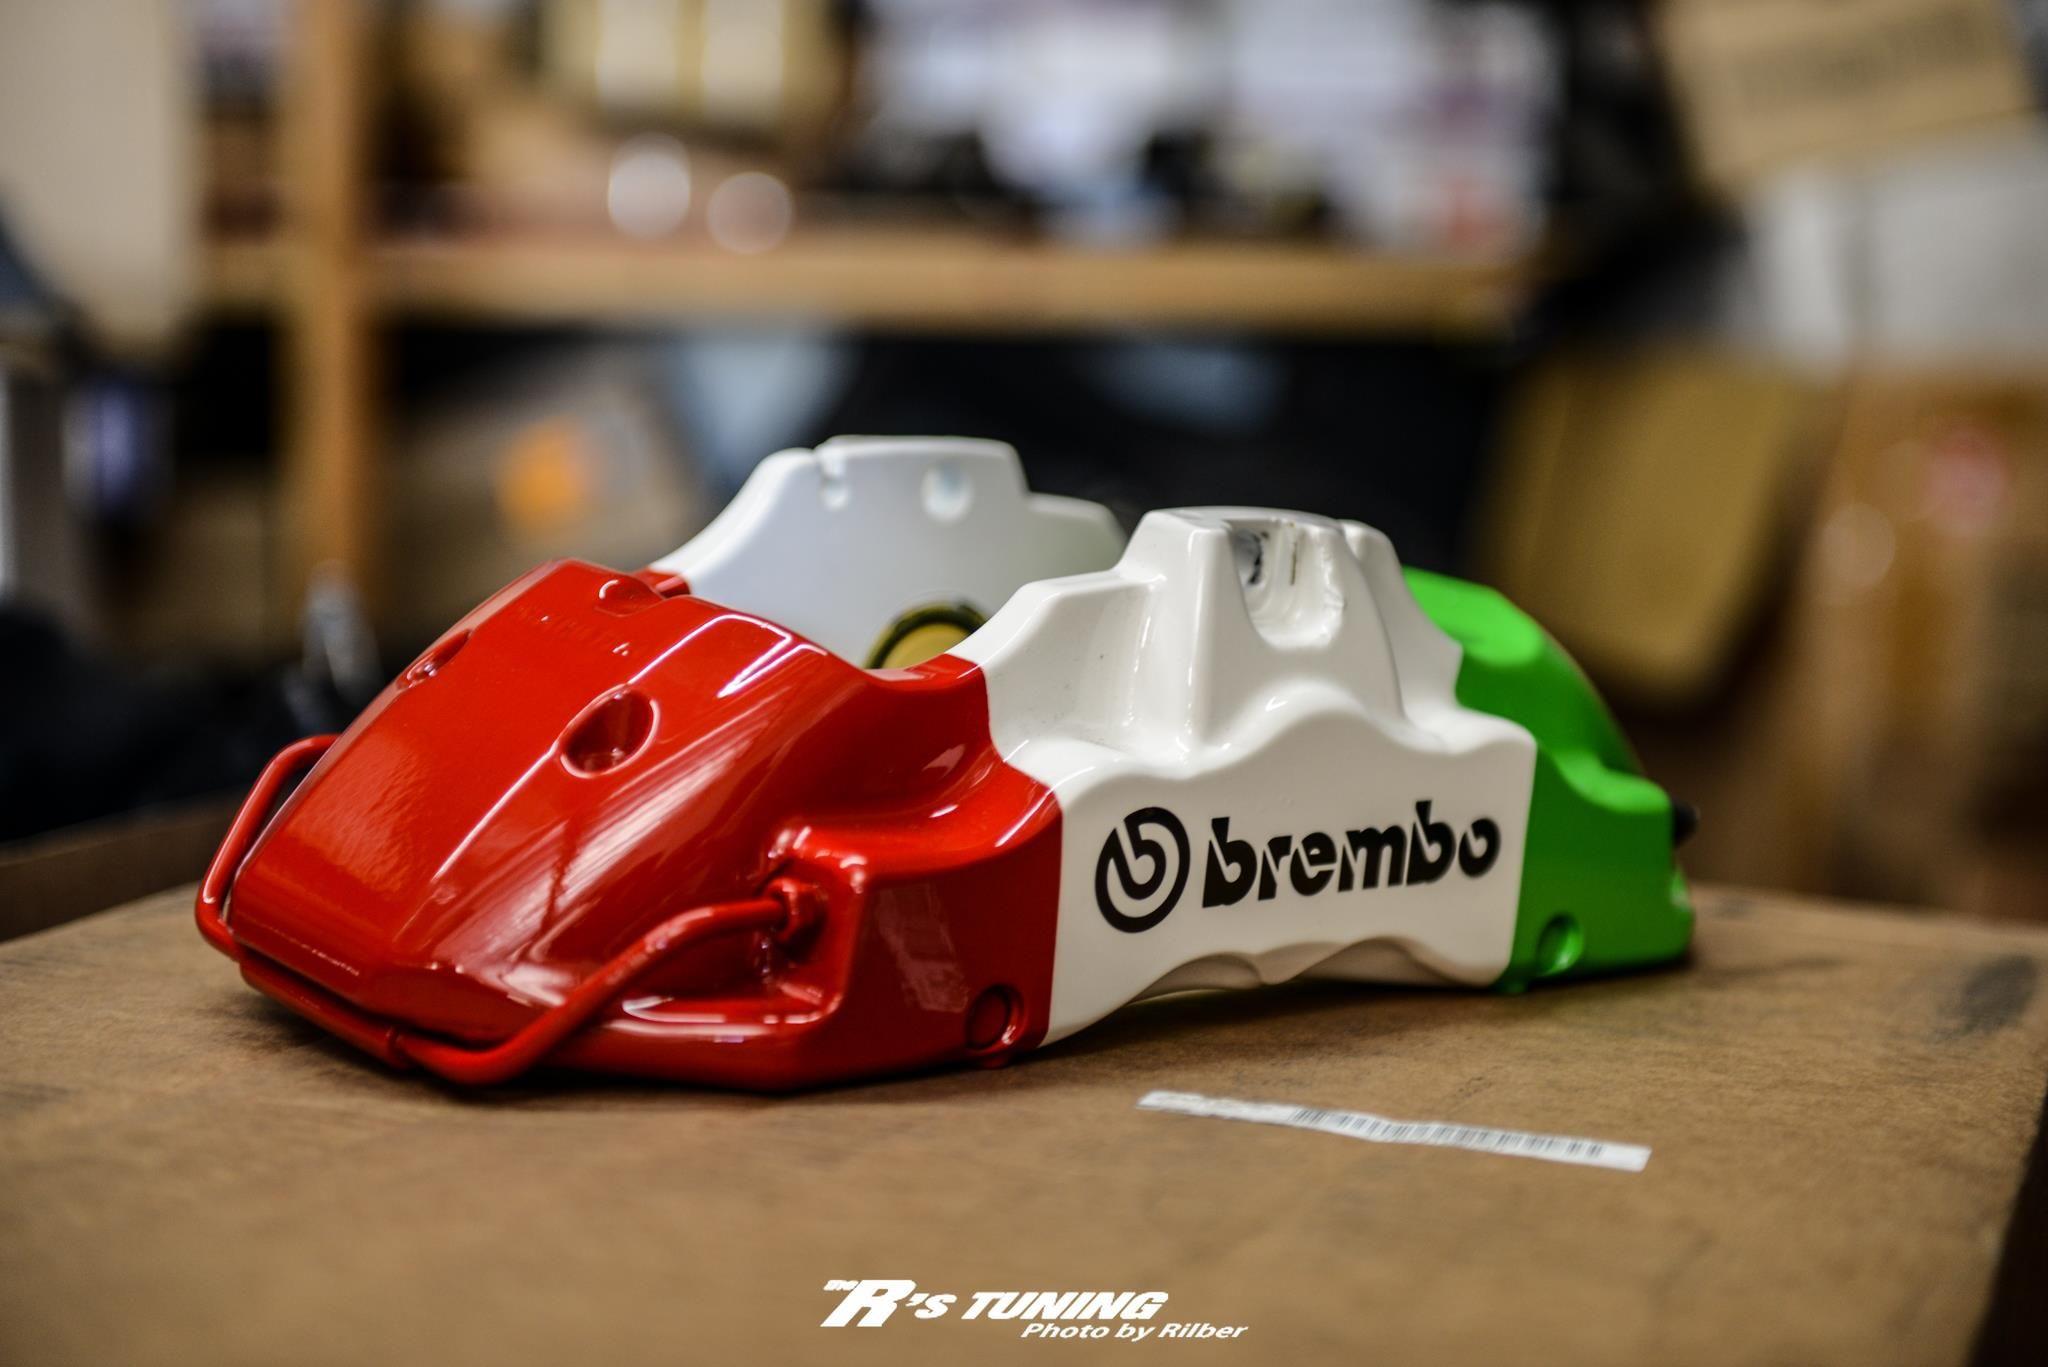 brembo - ferrari brake calipers in colors of italian flag